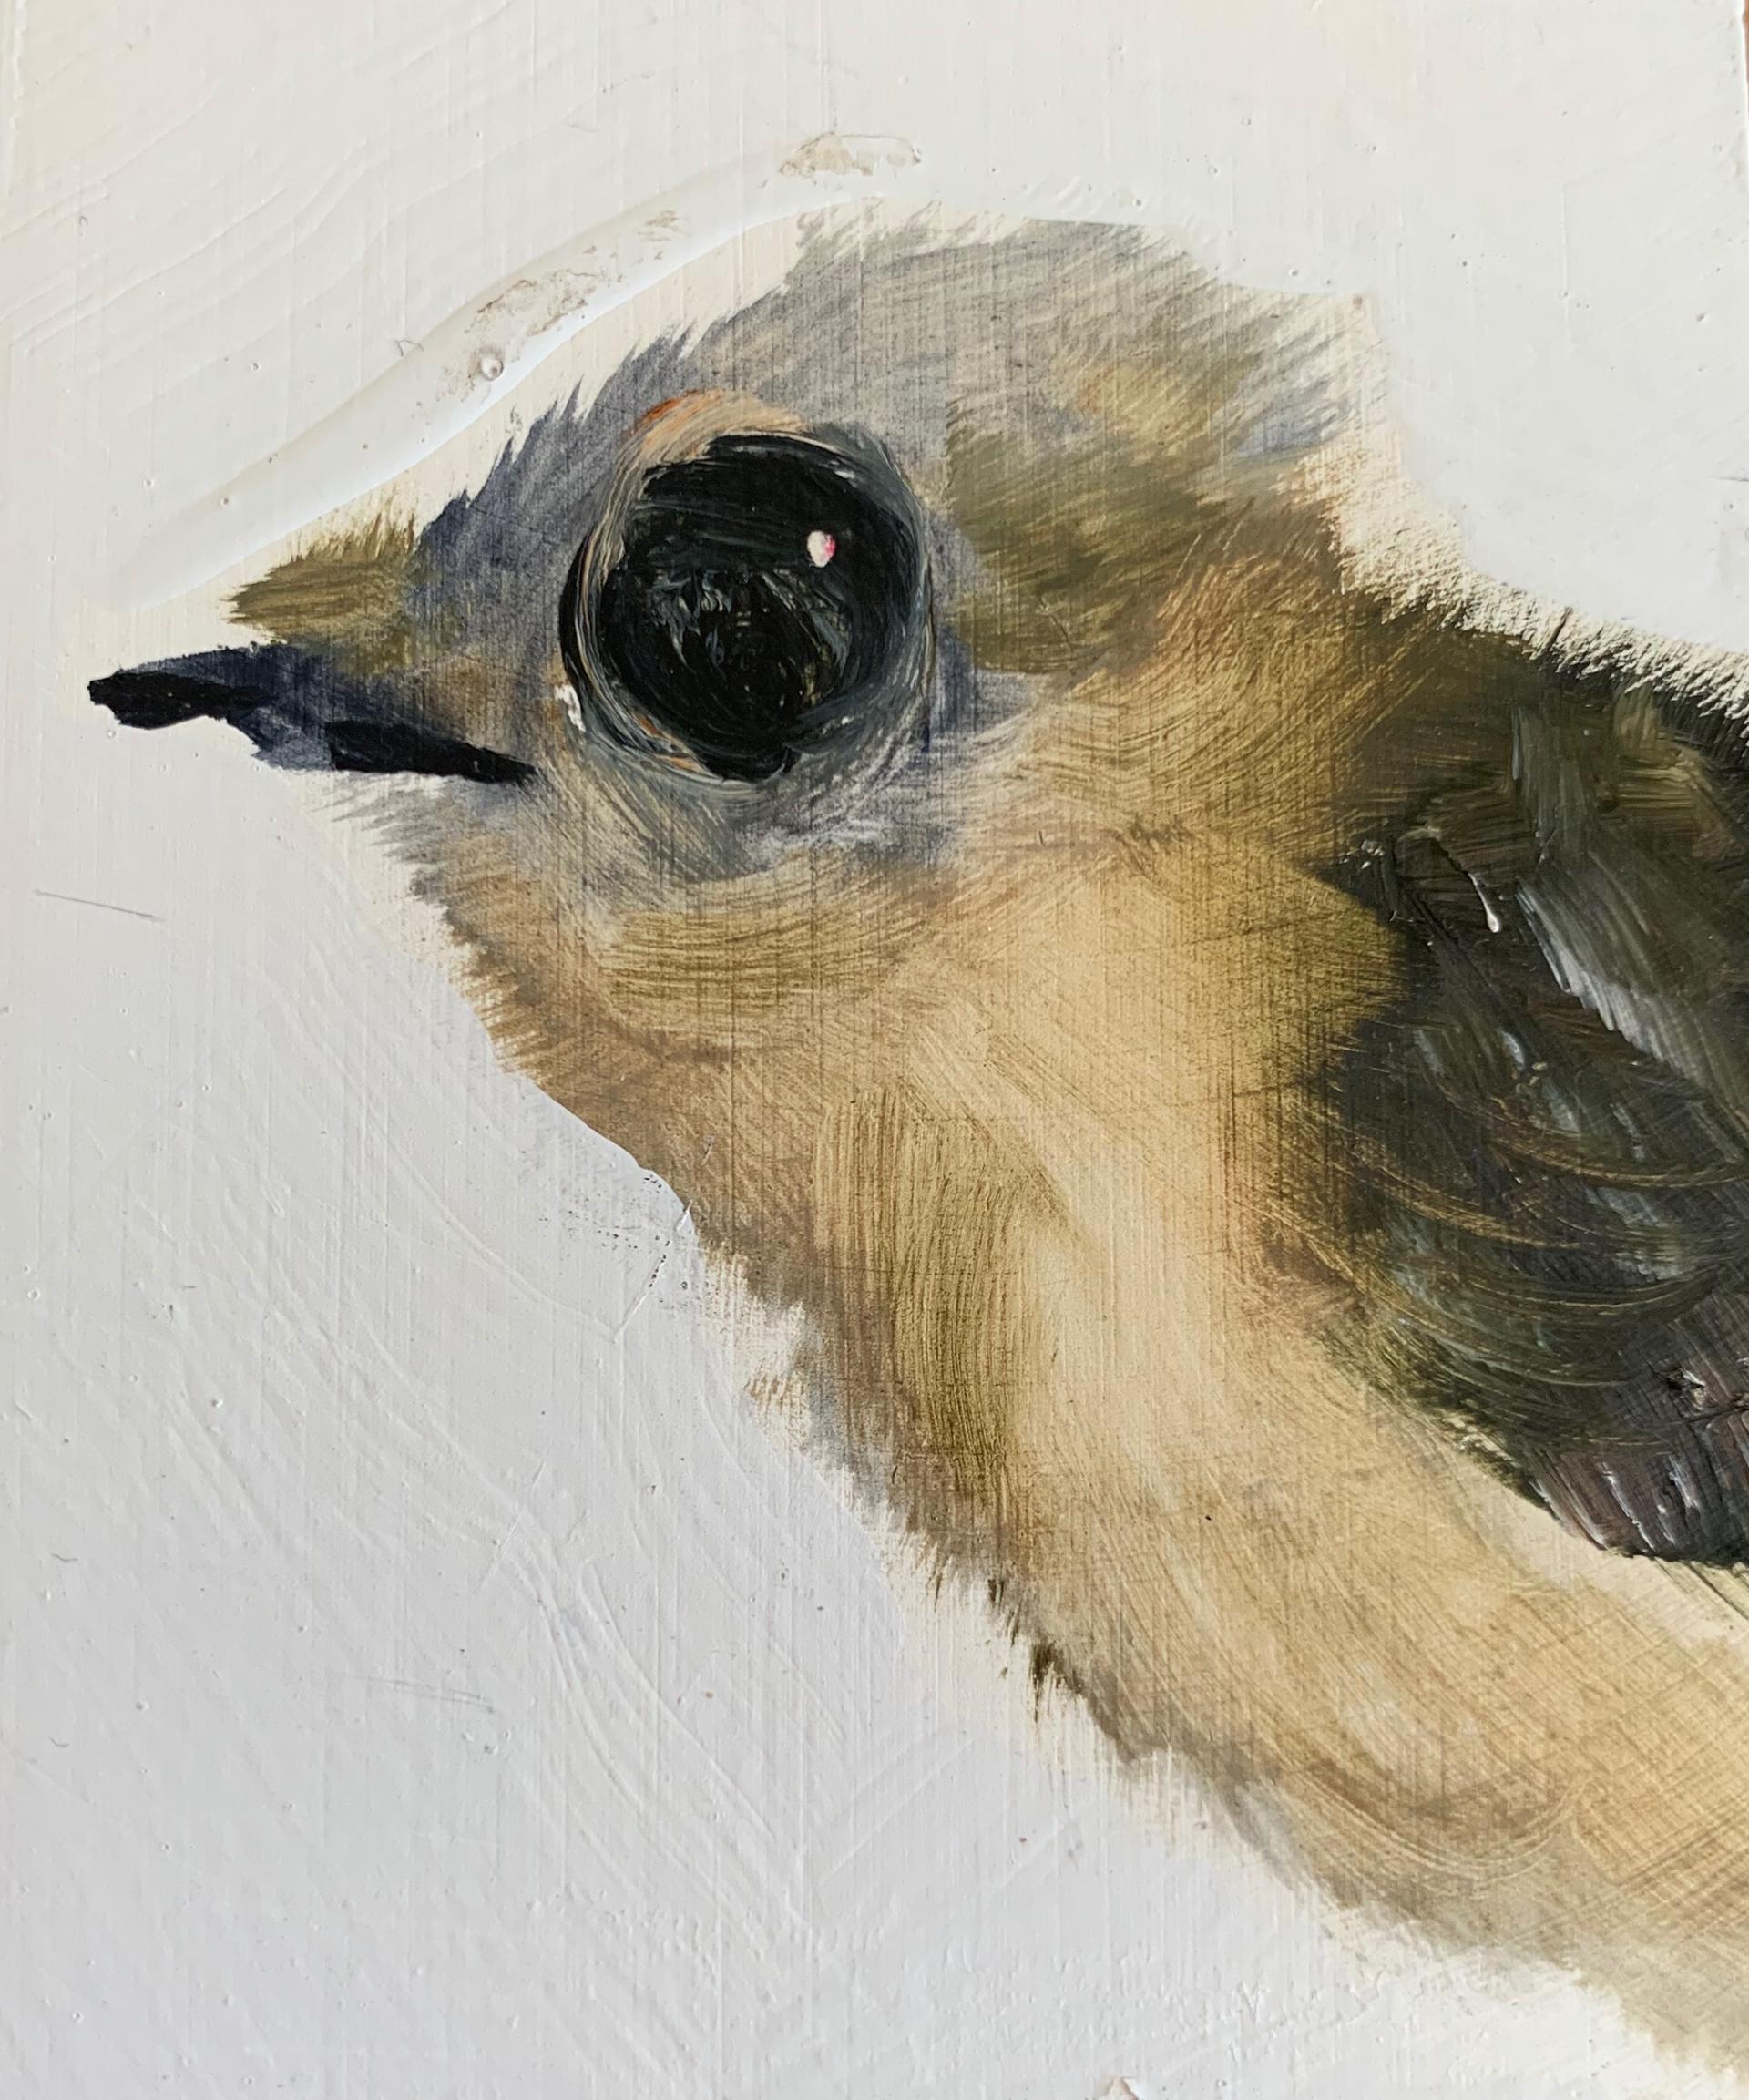 Little Bird #9 by Diane Kilgore Condon